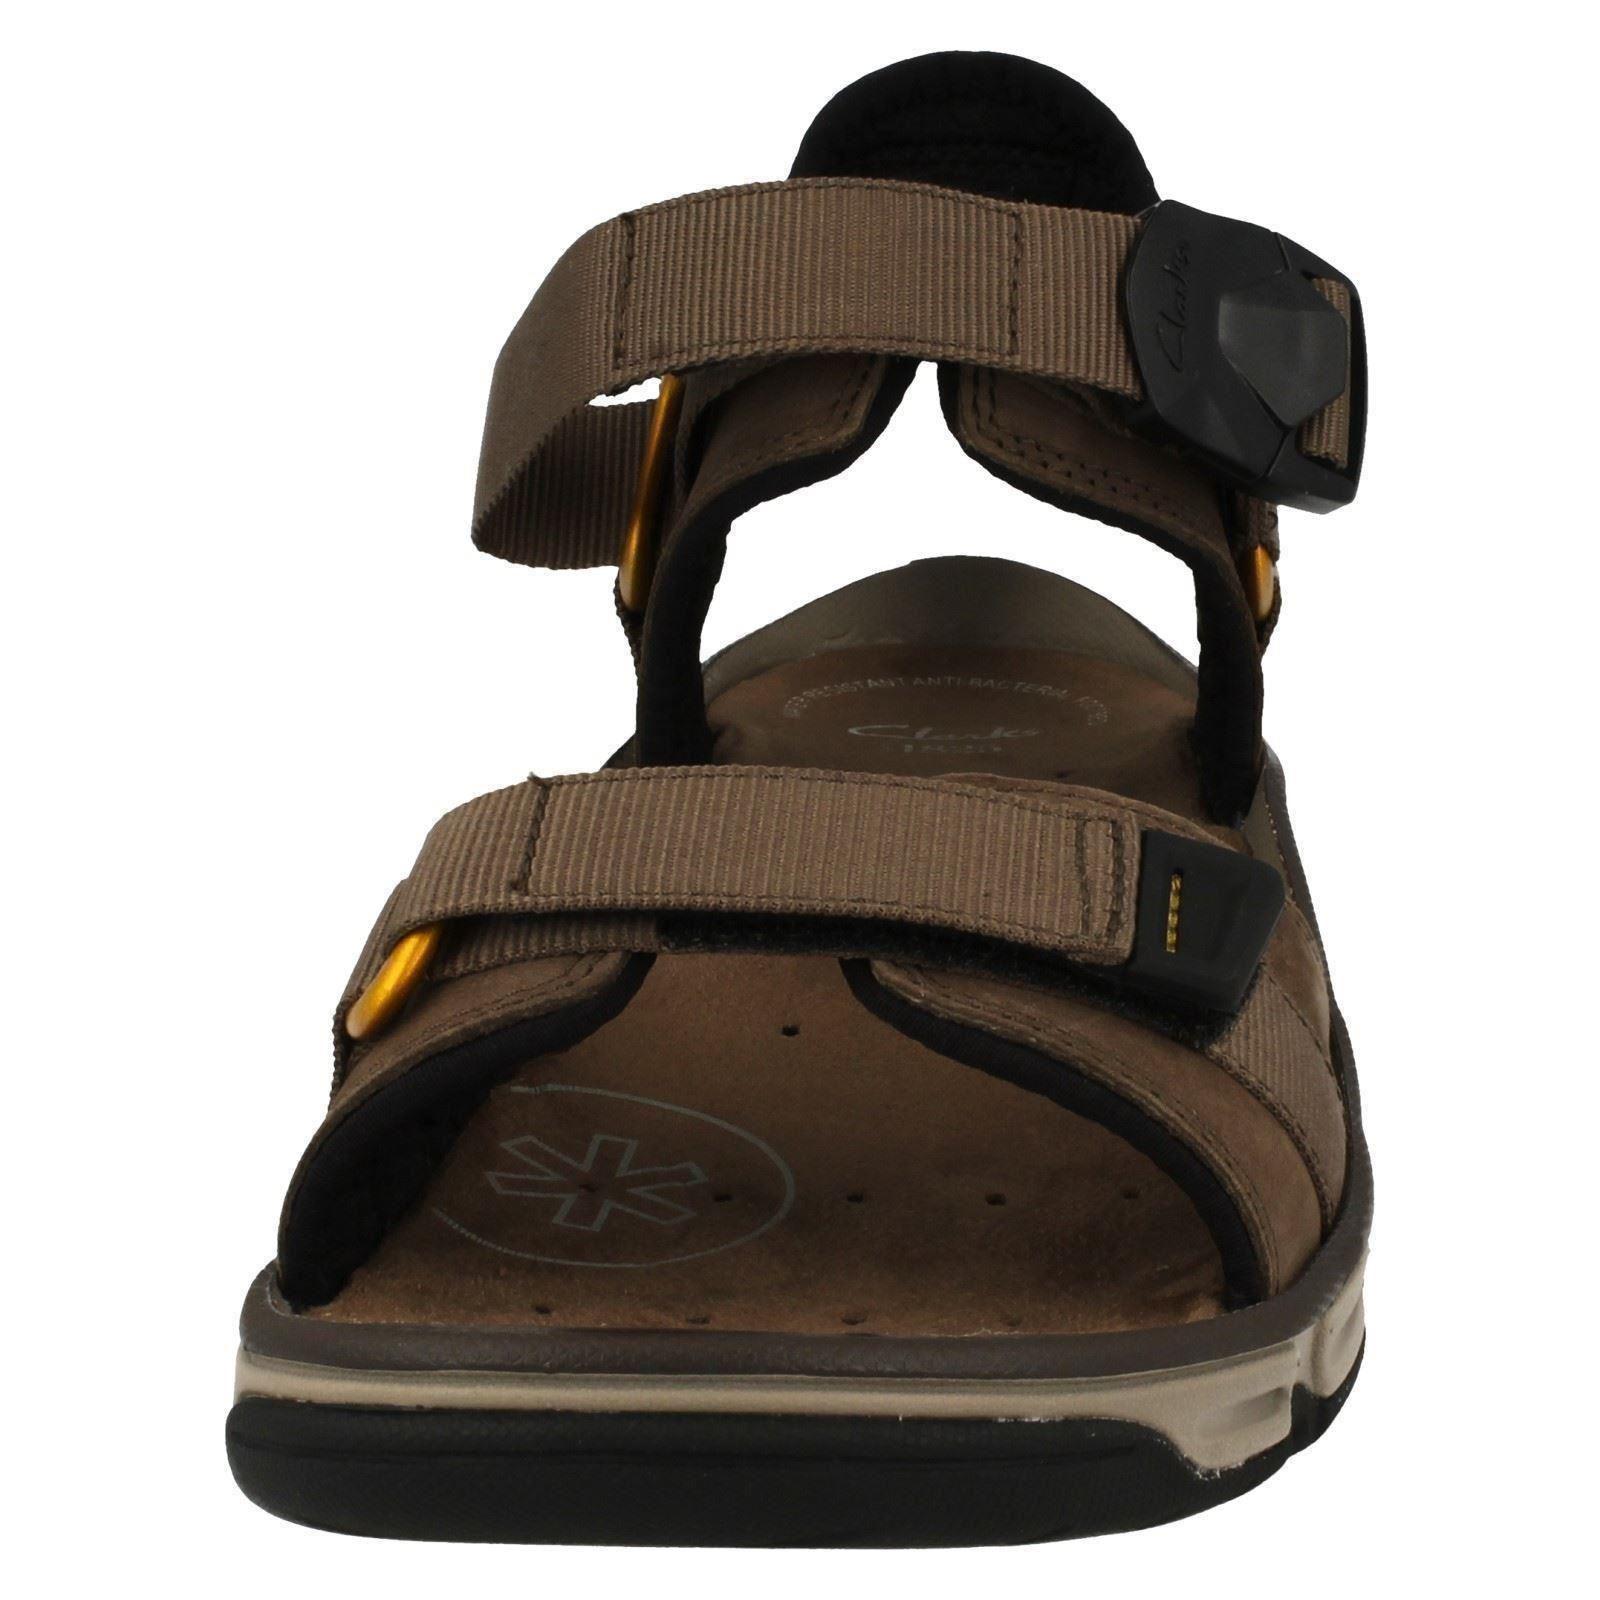 Men's Clarks Open Toe Magnetic Casual Summer Sandals Label - Explore Part